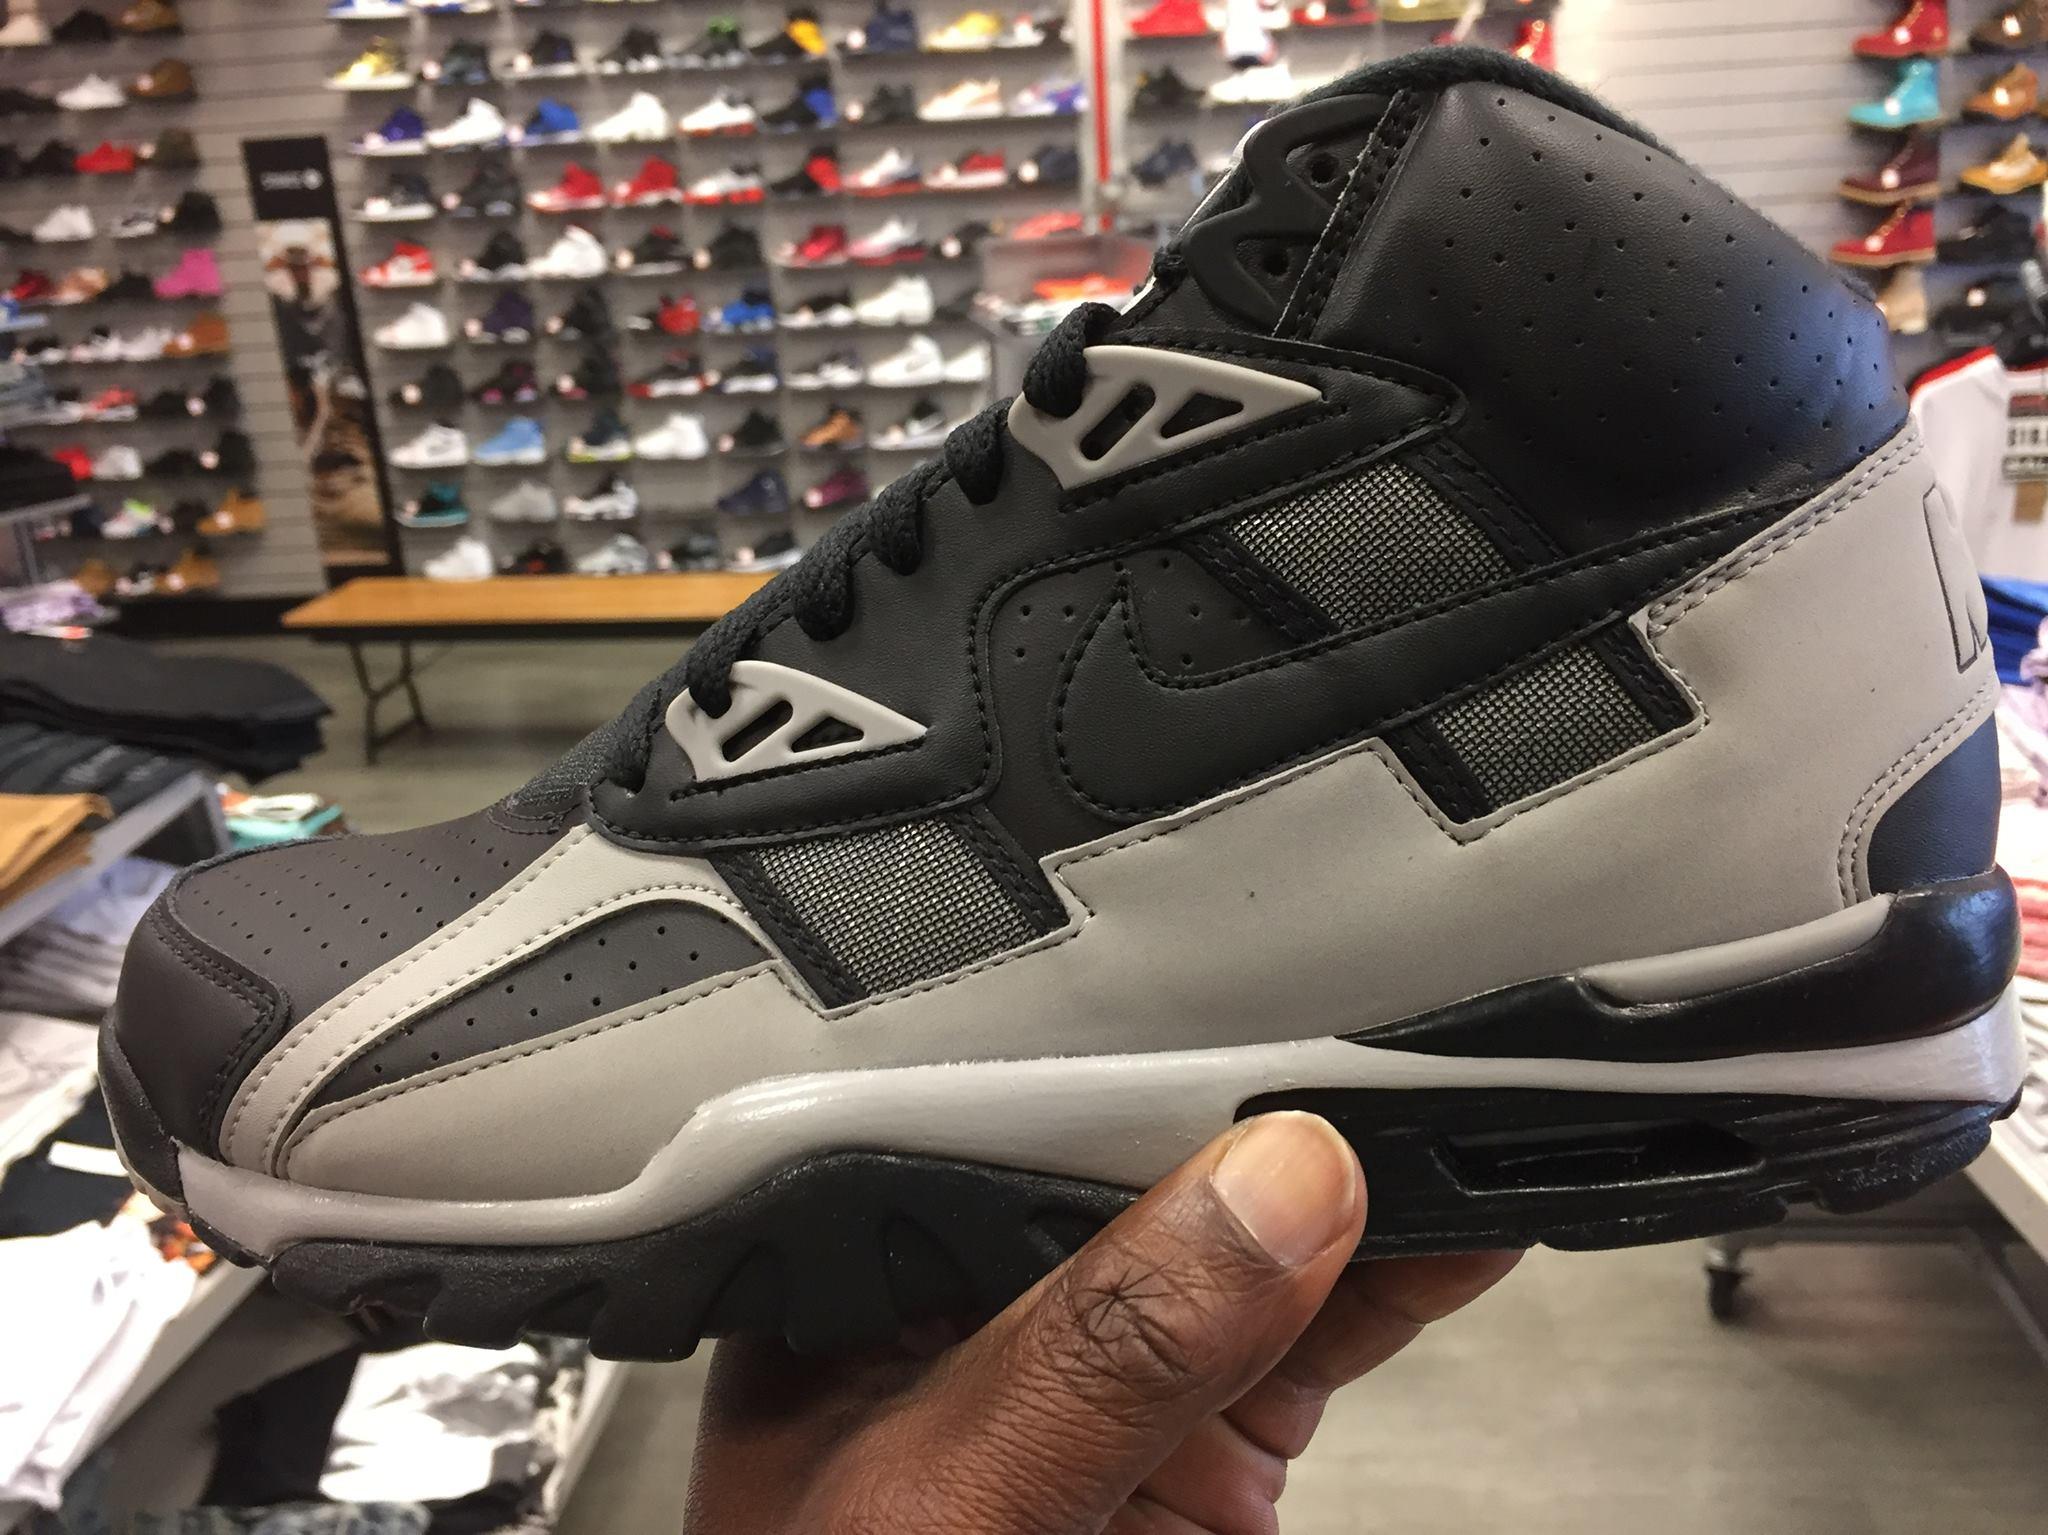 The Nike Air Trainer SC High Black Grey Raiders 302346-013